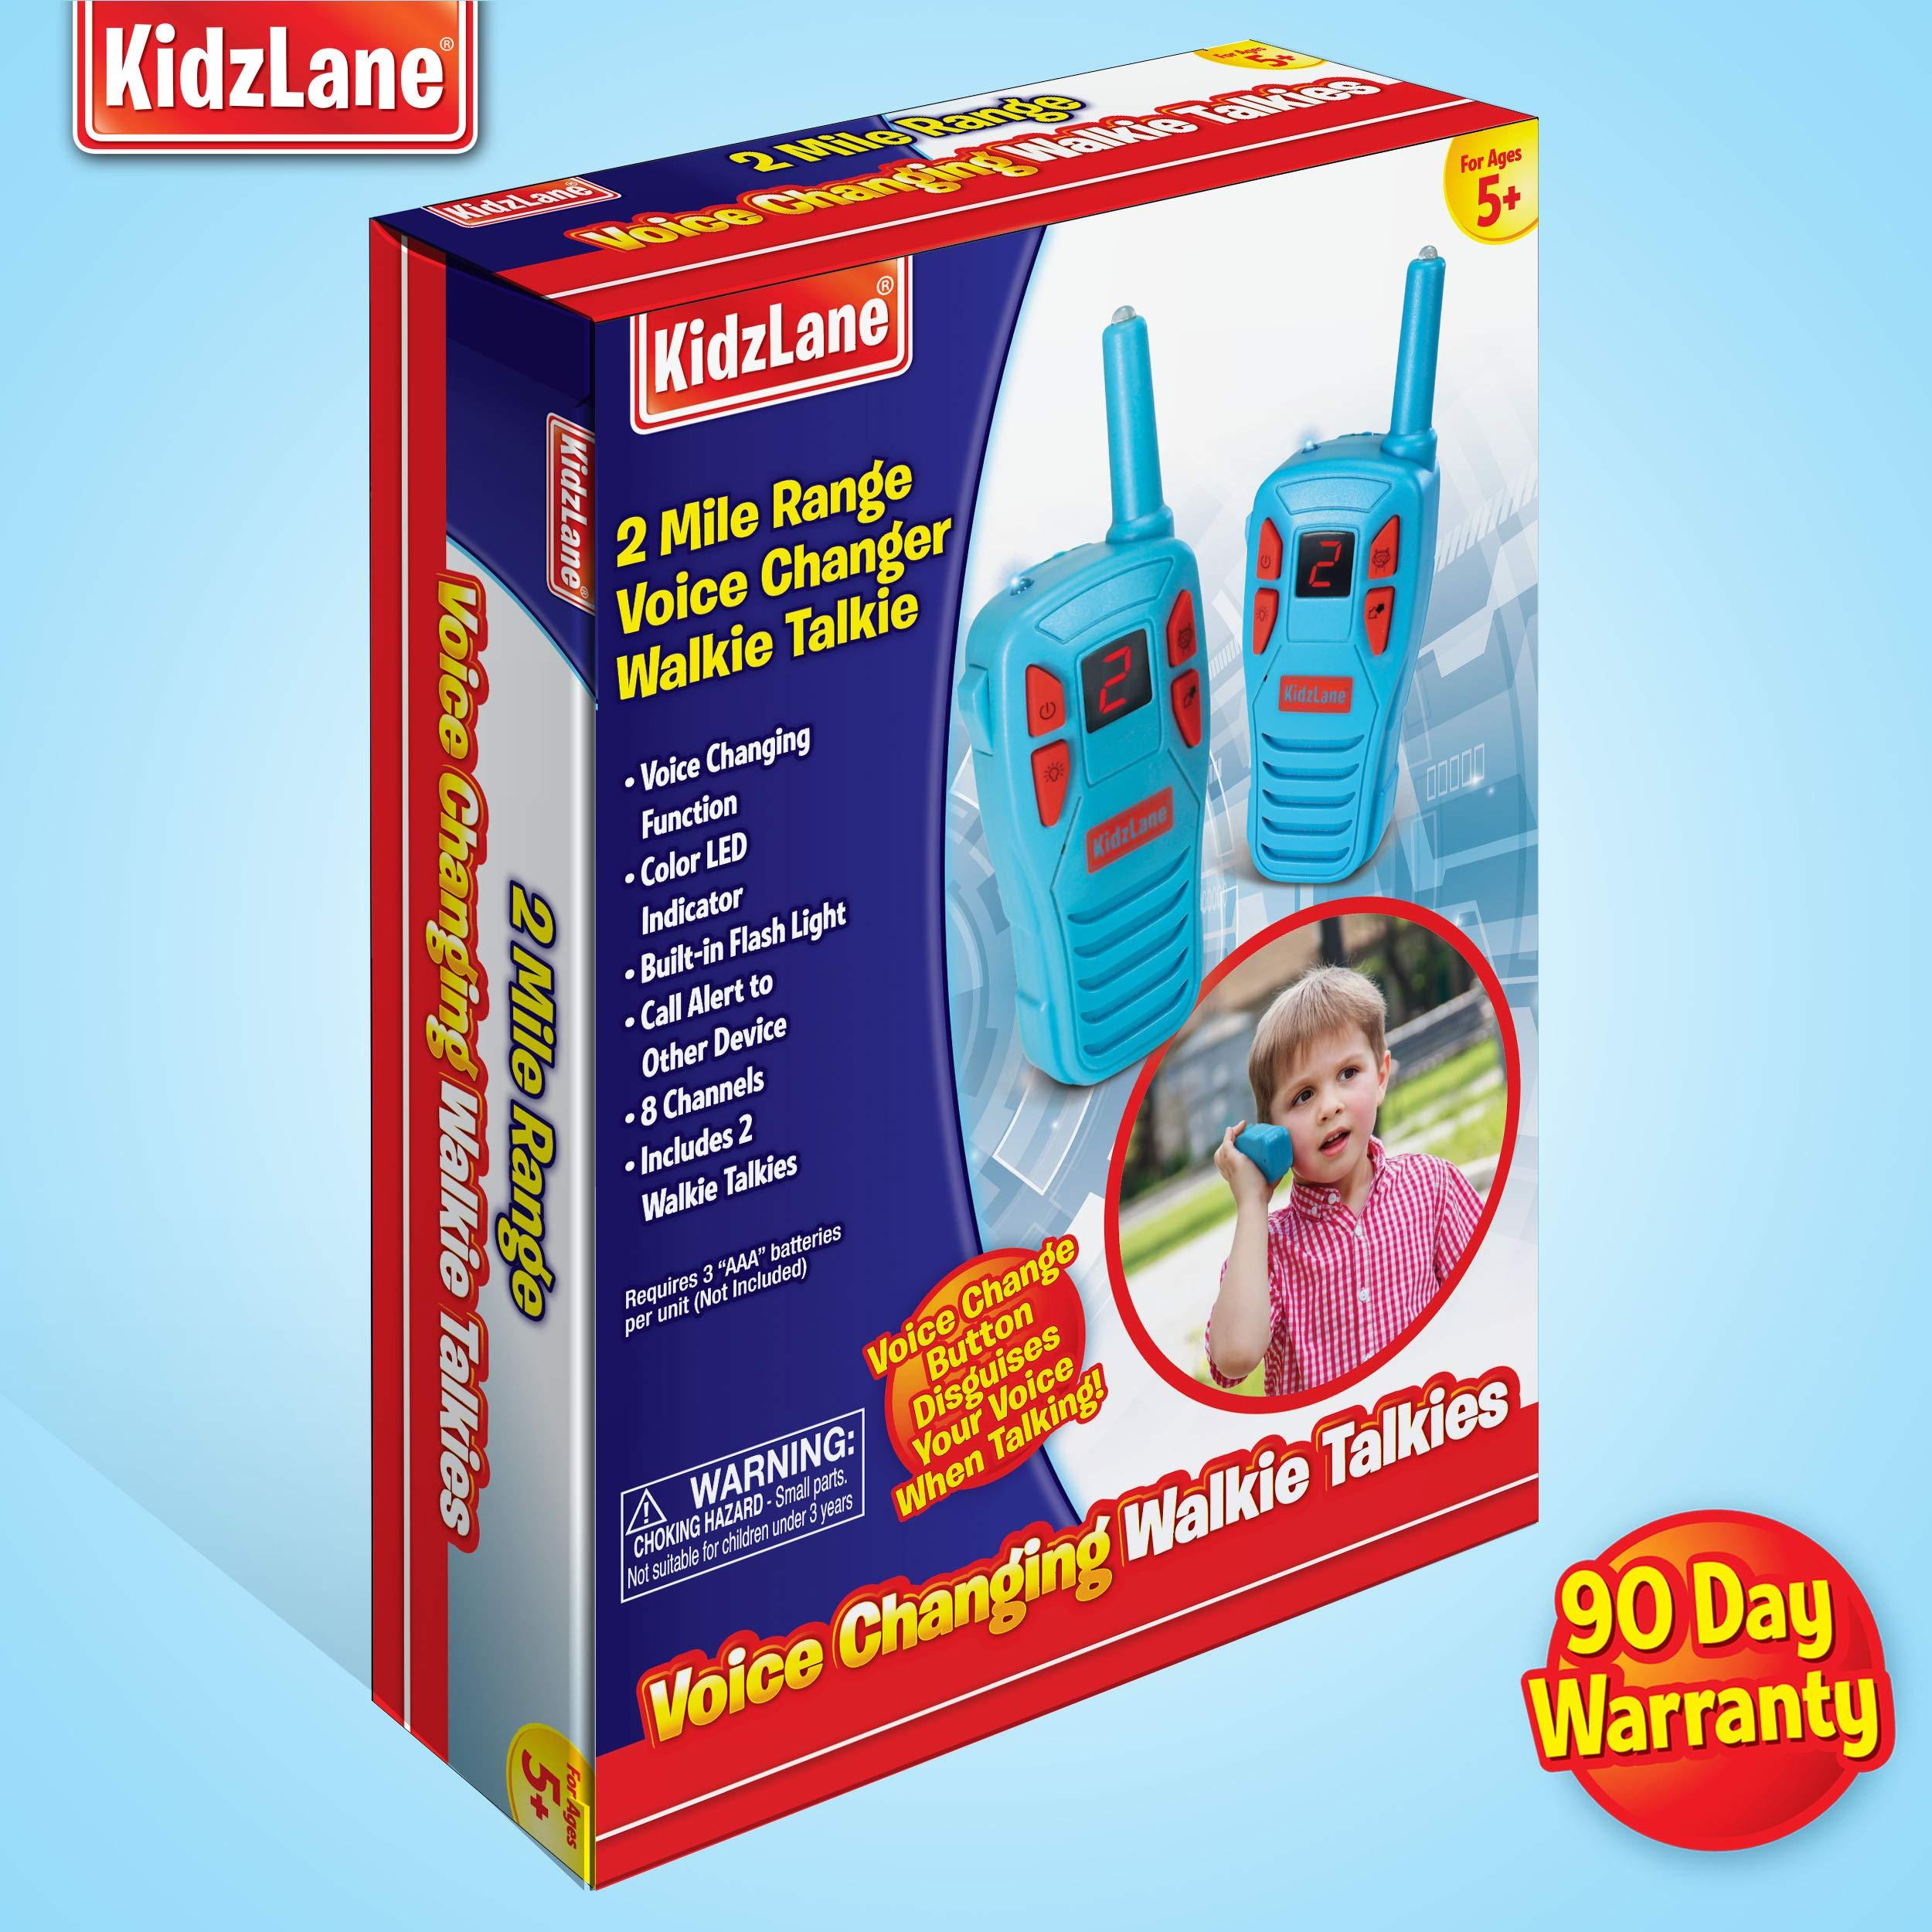 Kidzlane Voice Changing Walkie Talkies for Kids - 2 Mile Range, 8 Channels, Flashlight, & Call Alert by Kidzlane (Image #5)